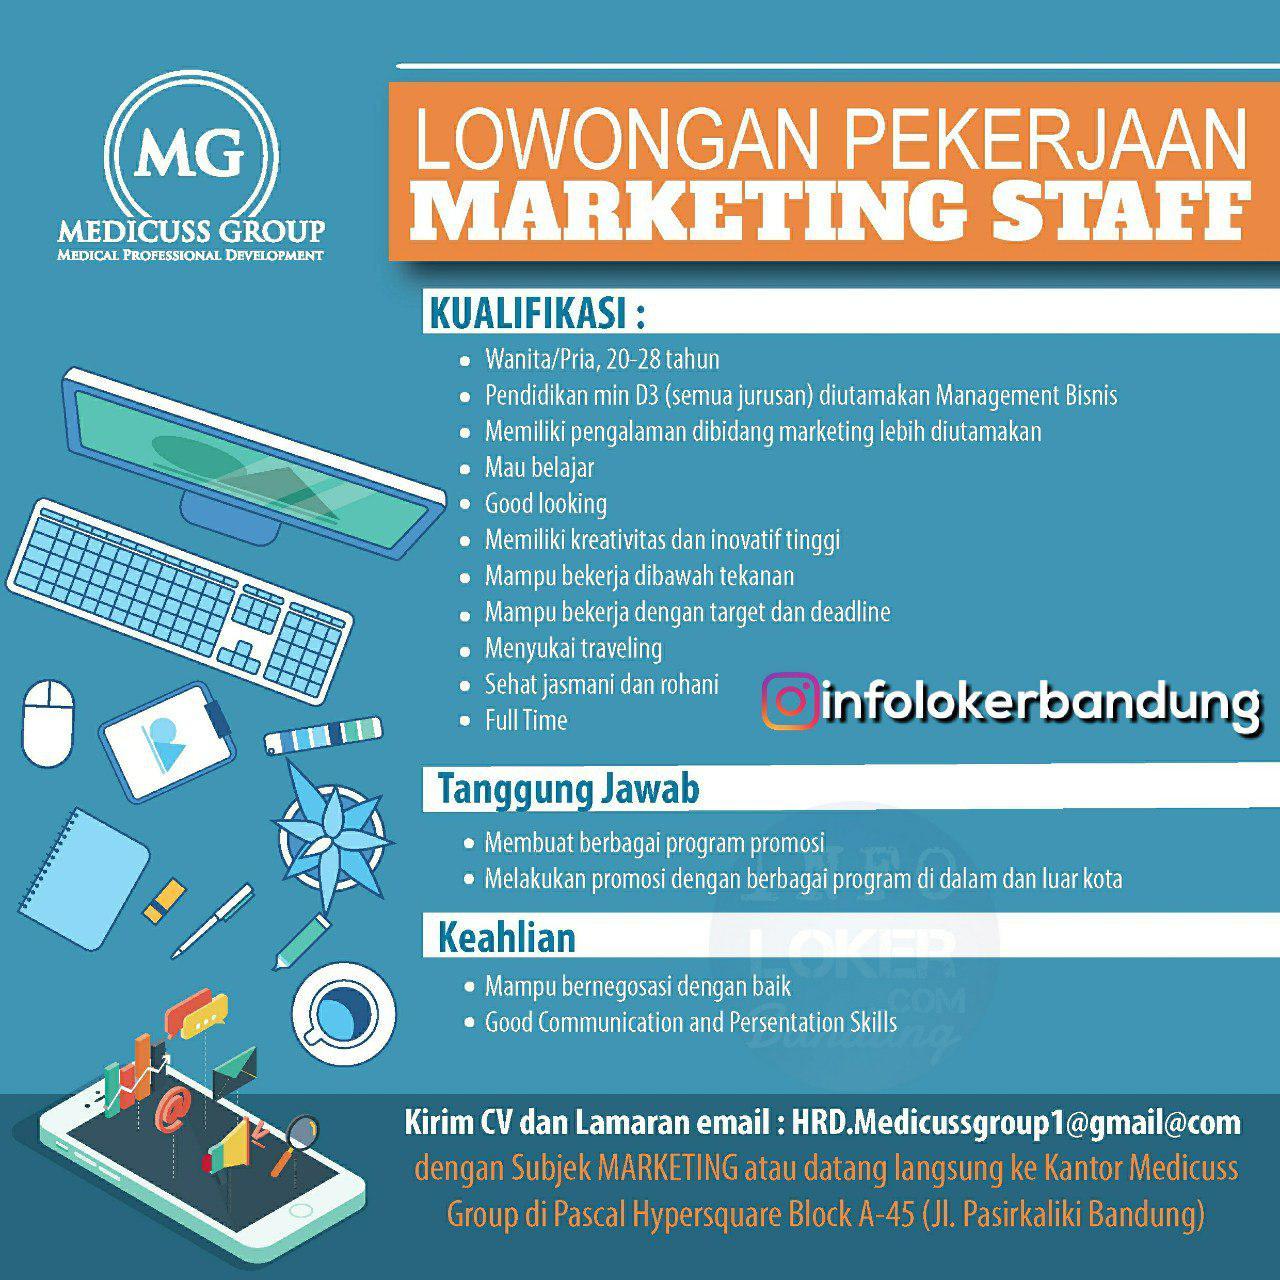 Lowongan Kerja Medicuss Group Bandung Mei 2018